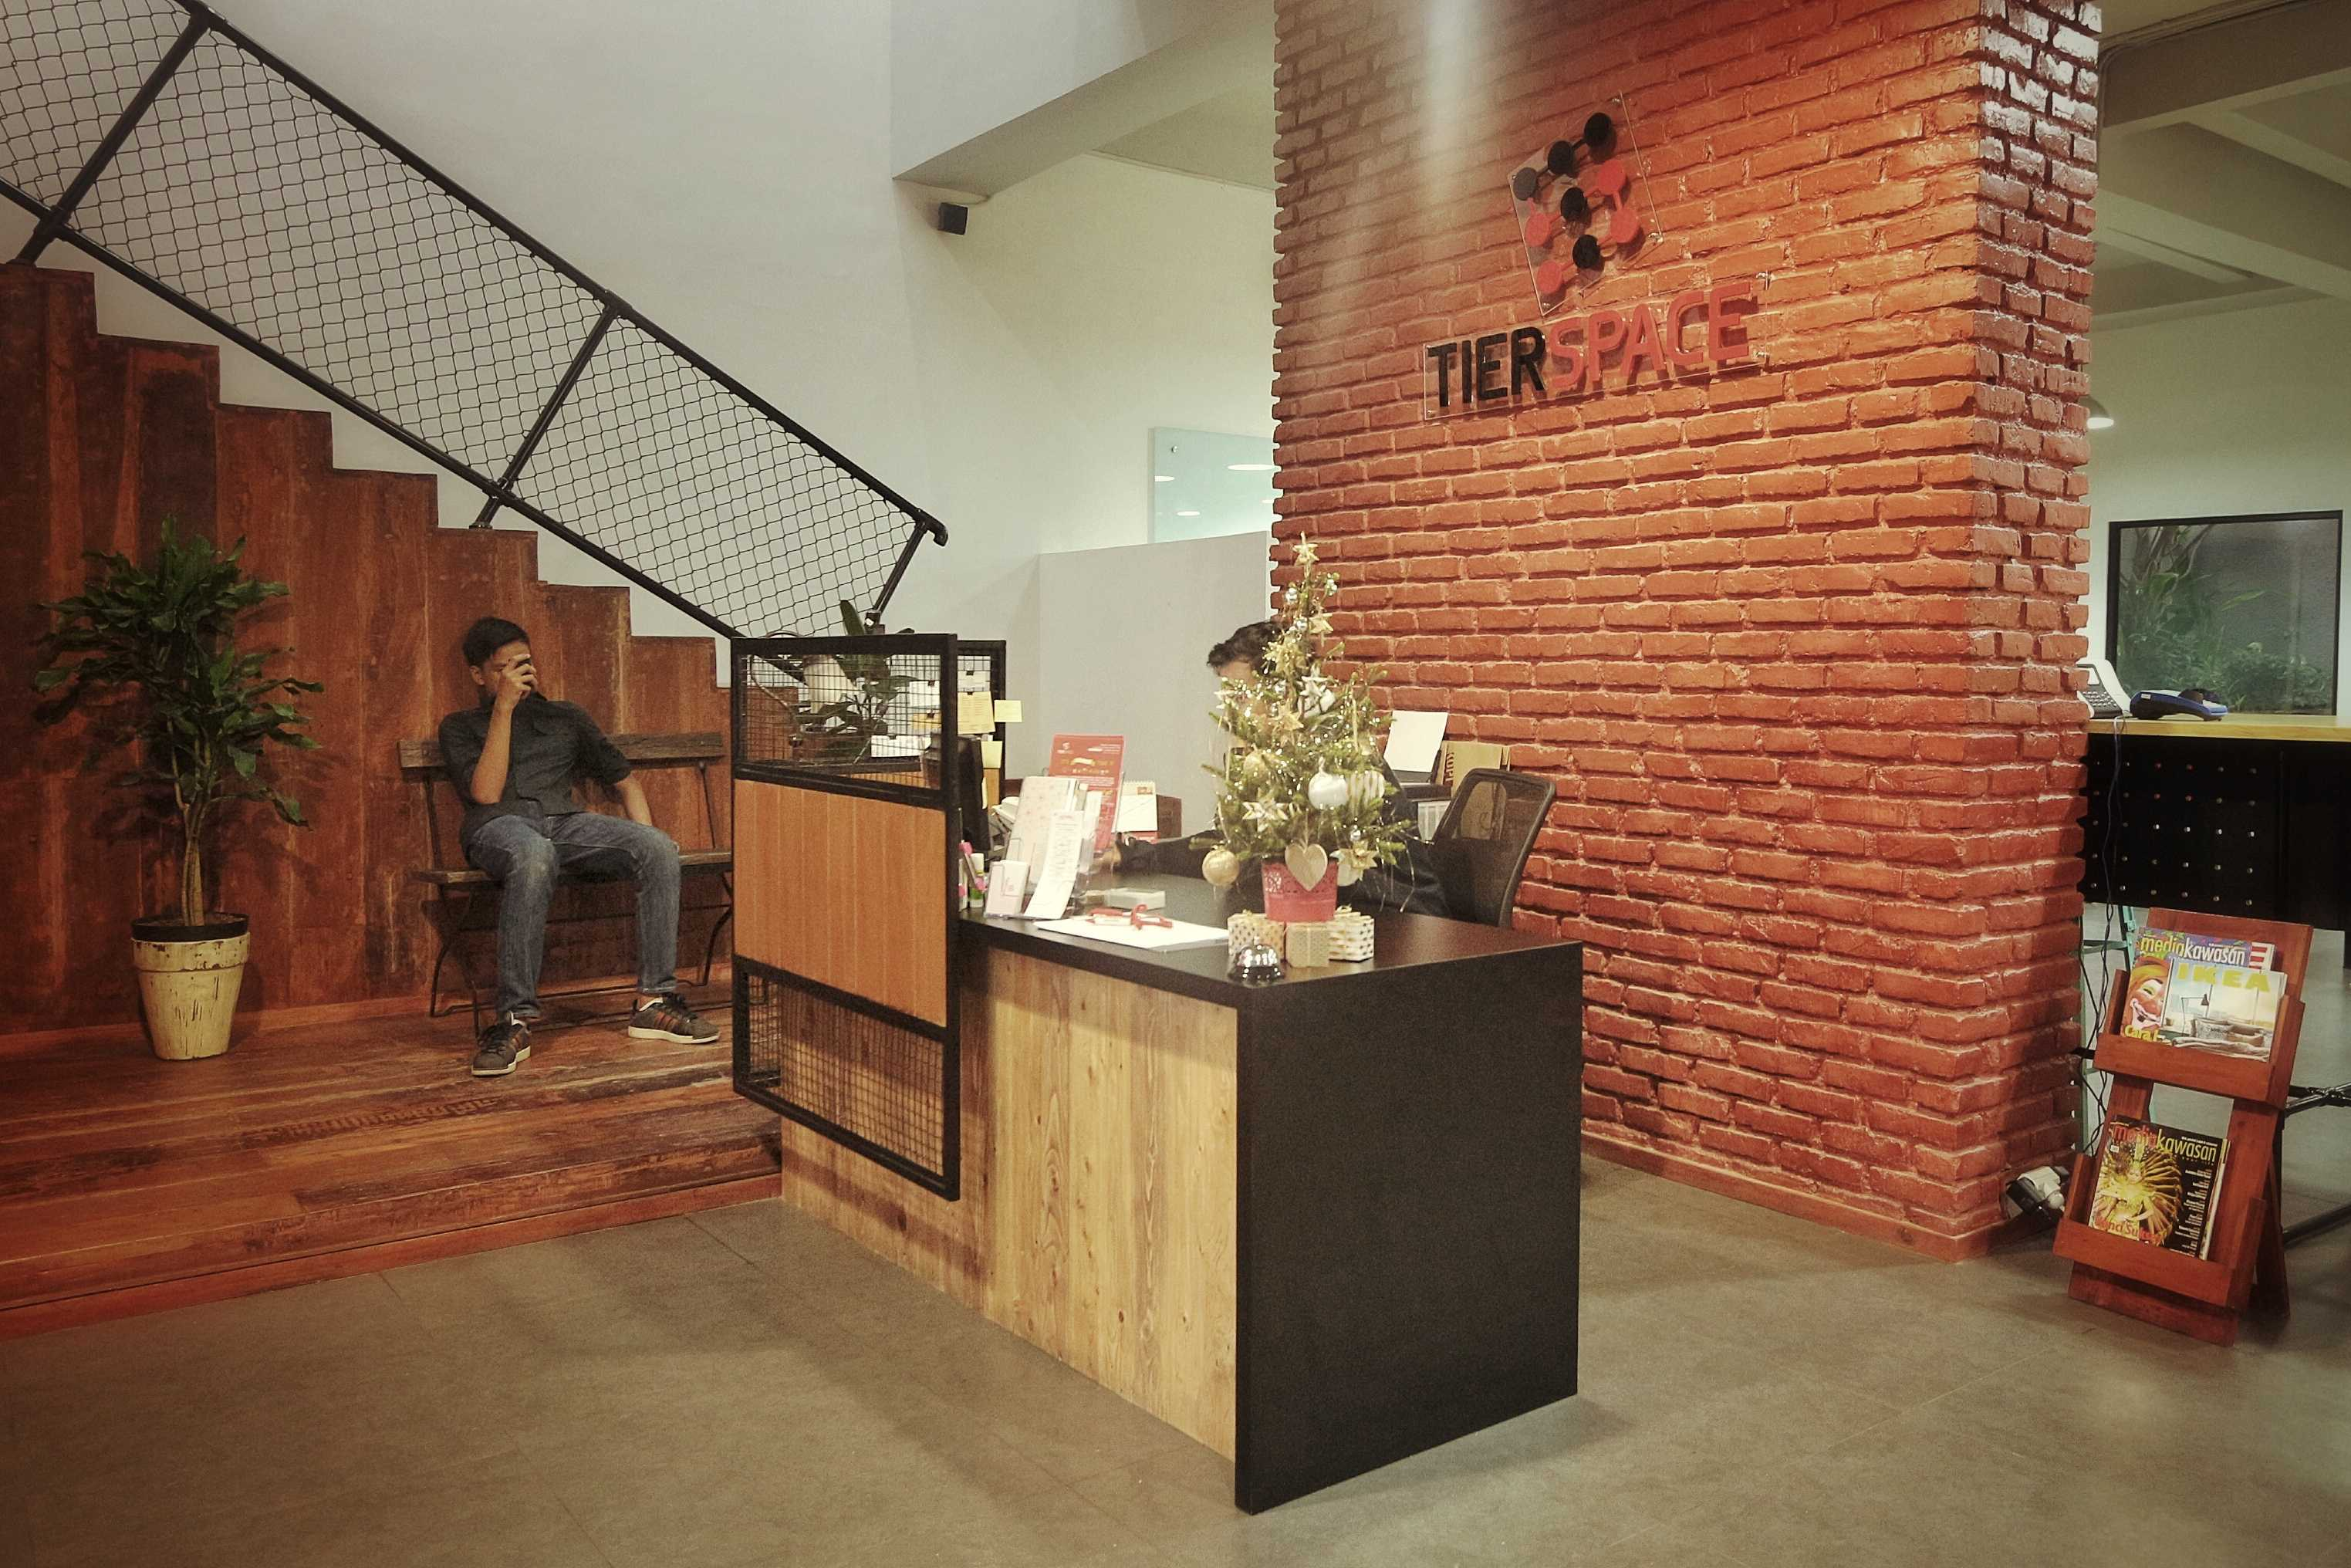 Kotak Design Tier Space Interior Jakarta, Daerah Khusus Ibukota Jakarta, Indonesia Jakarta, Daerah Khusus Ibukota Jakarta, Indonesia Tier Space Interior - Receptionist Area Modern  45455